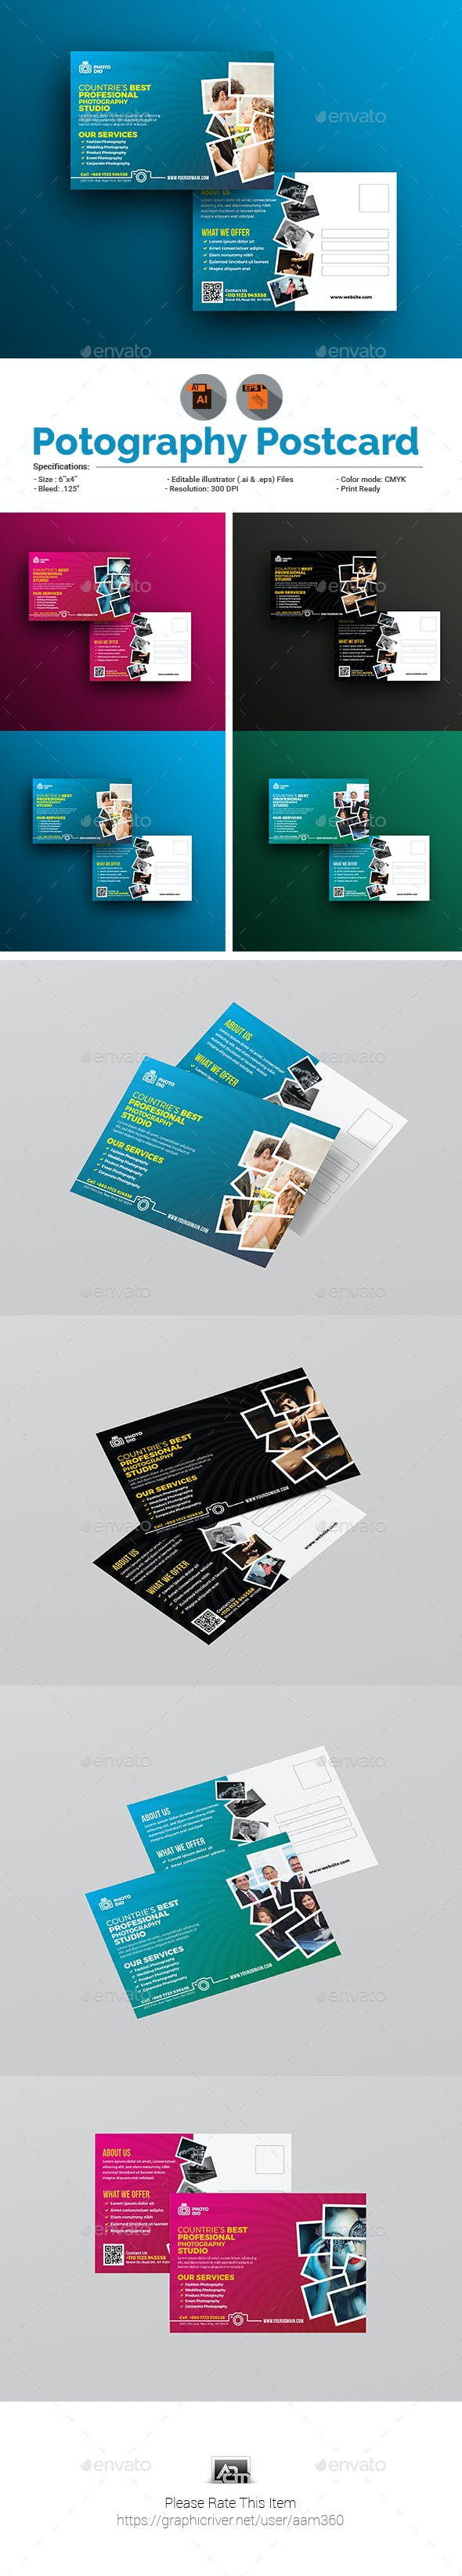 Photography/Photo Studio Postcard Template